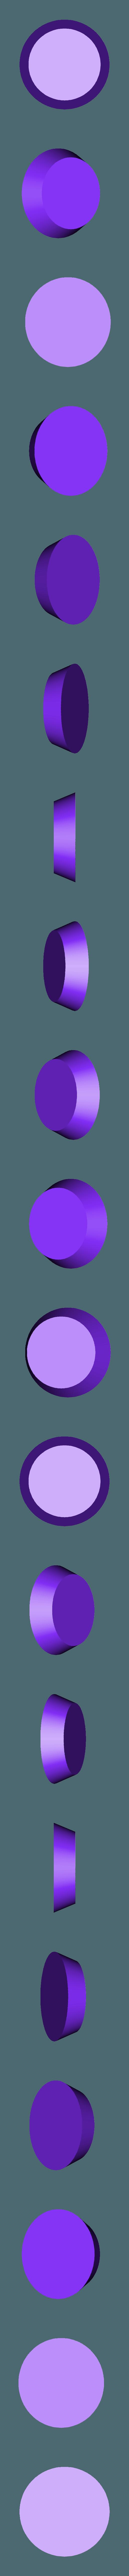 pied_gb_v1.stl Download free STL file StarScan_Dub_Turntable • 3D printing object, jurekkb